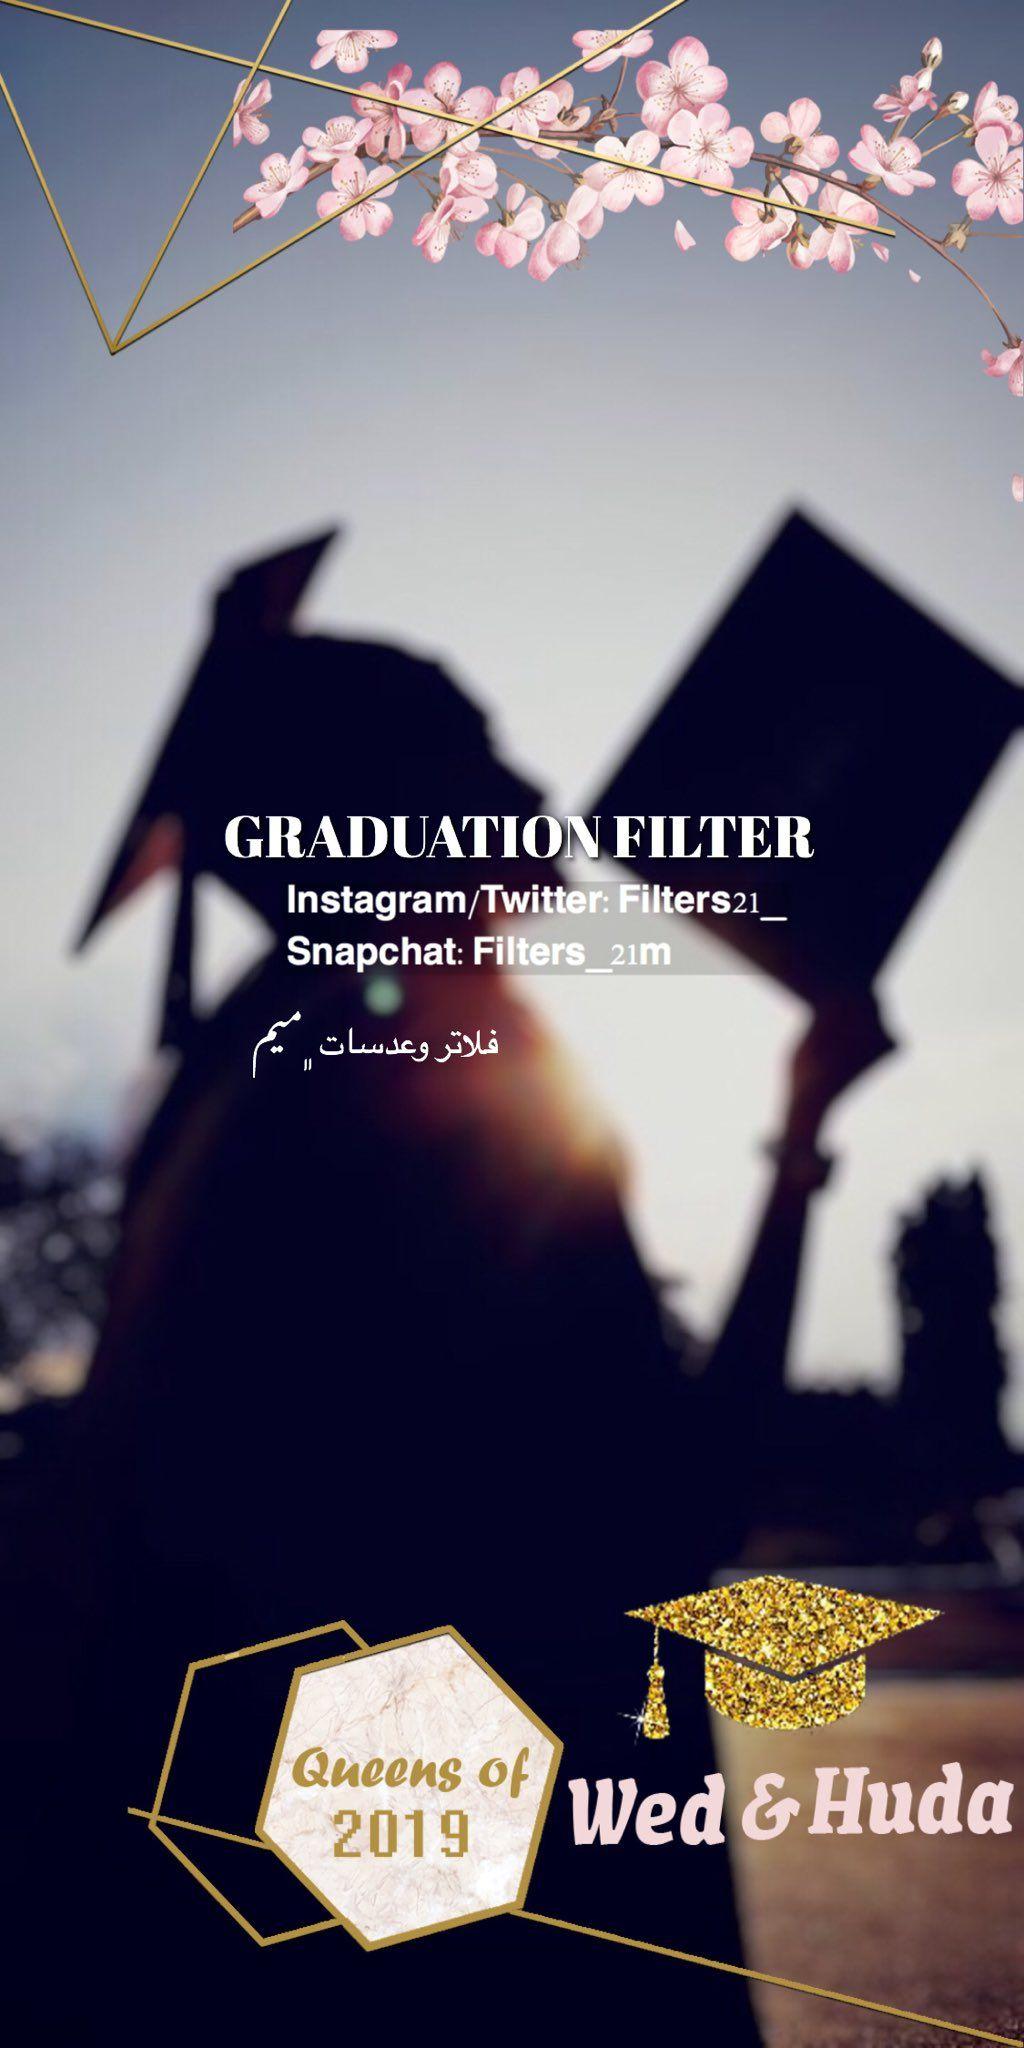 فلتر تخرج فلاتر عدسات دعوات Instagram Filter Instagram Graduation